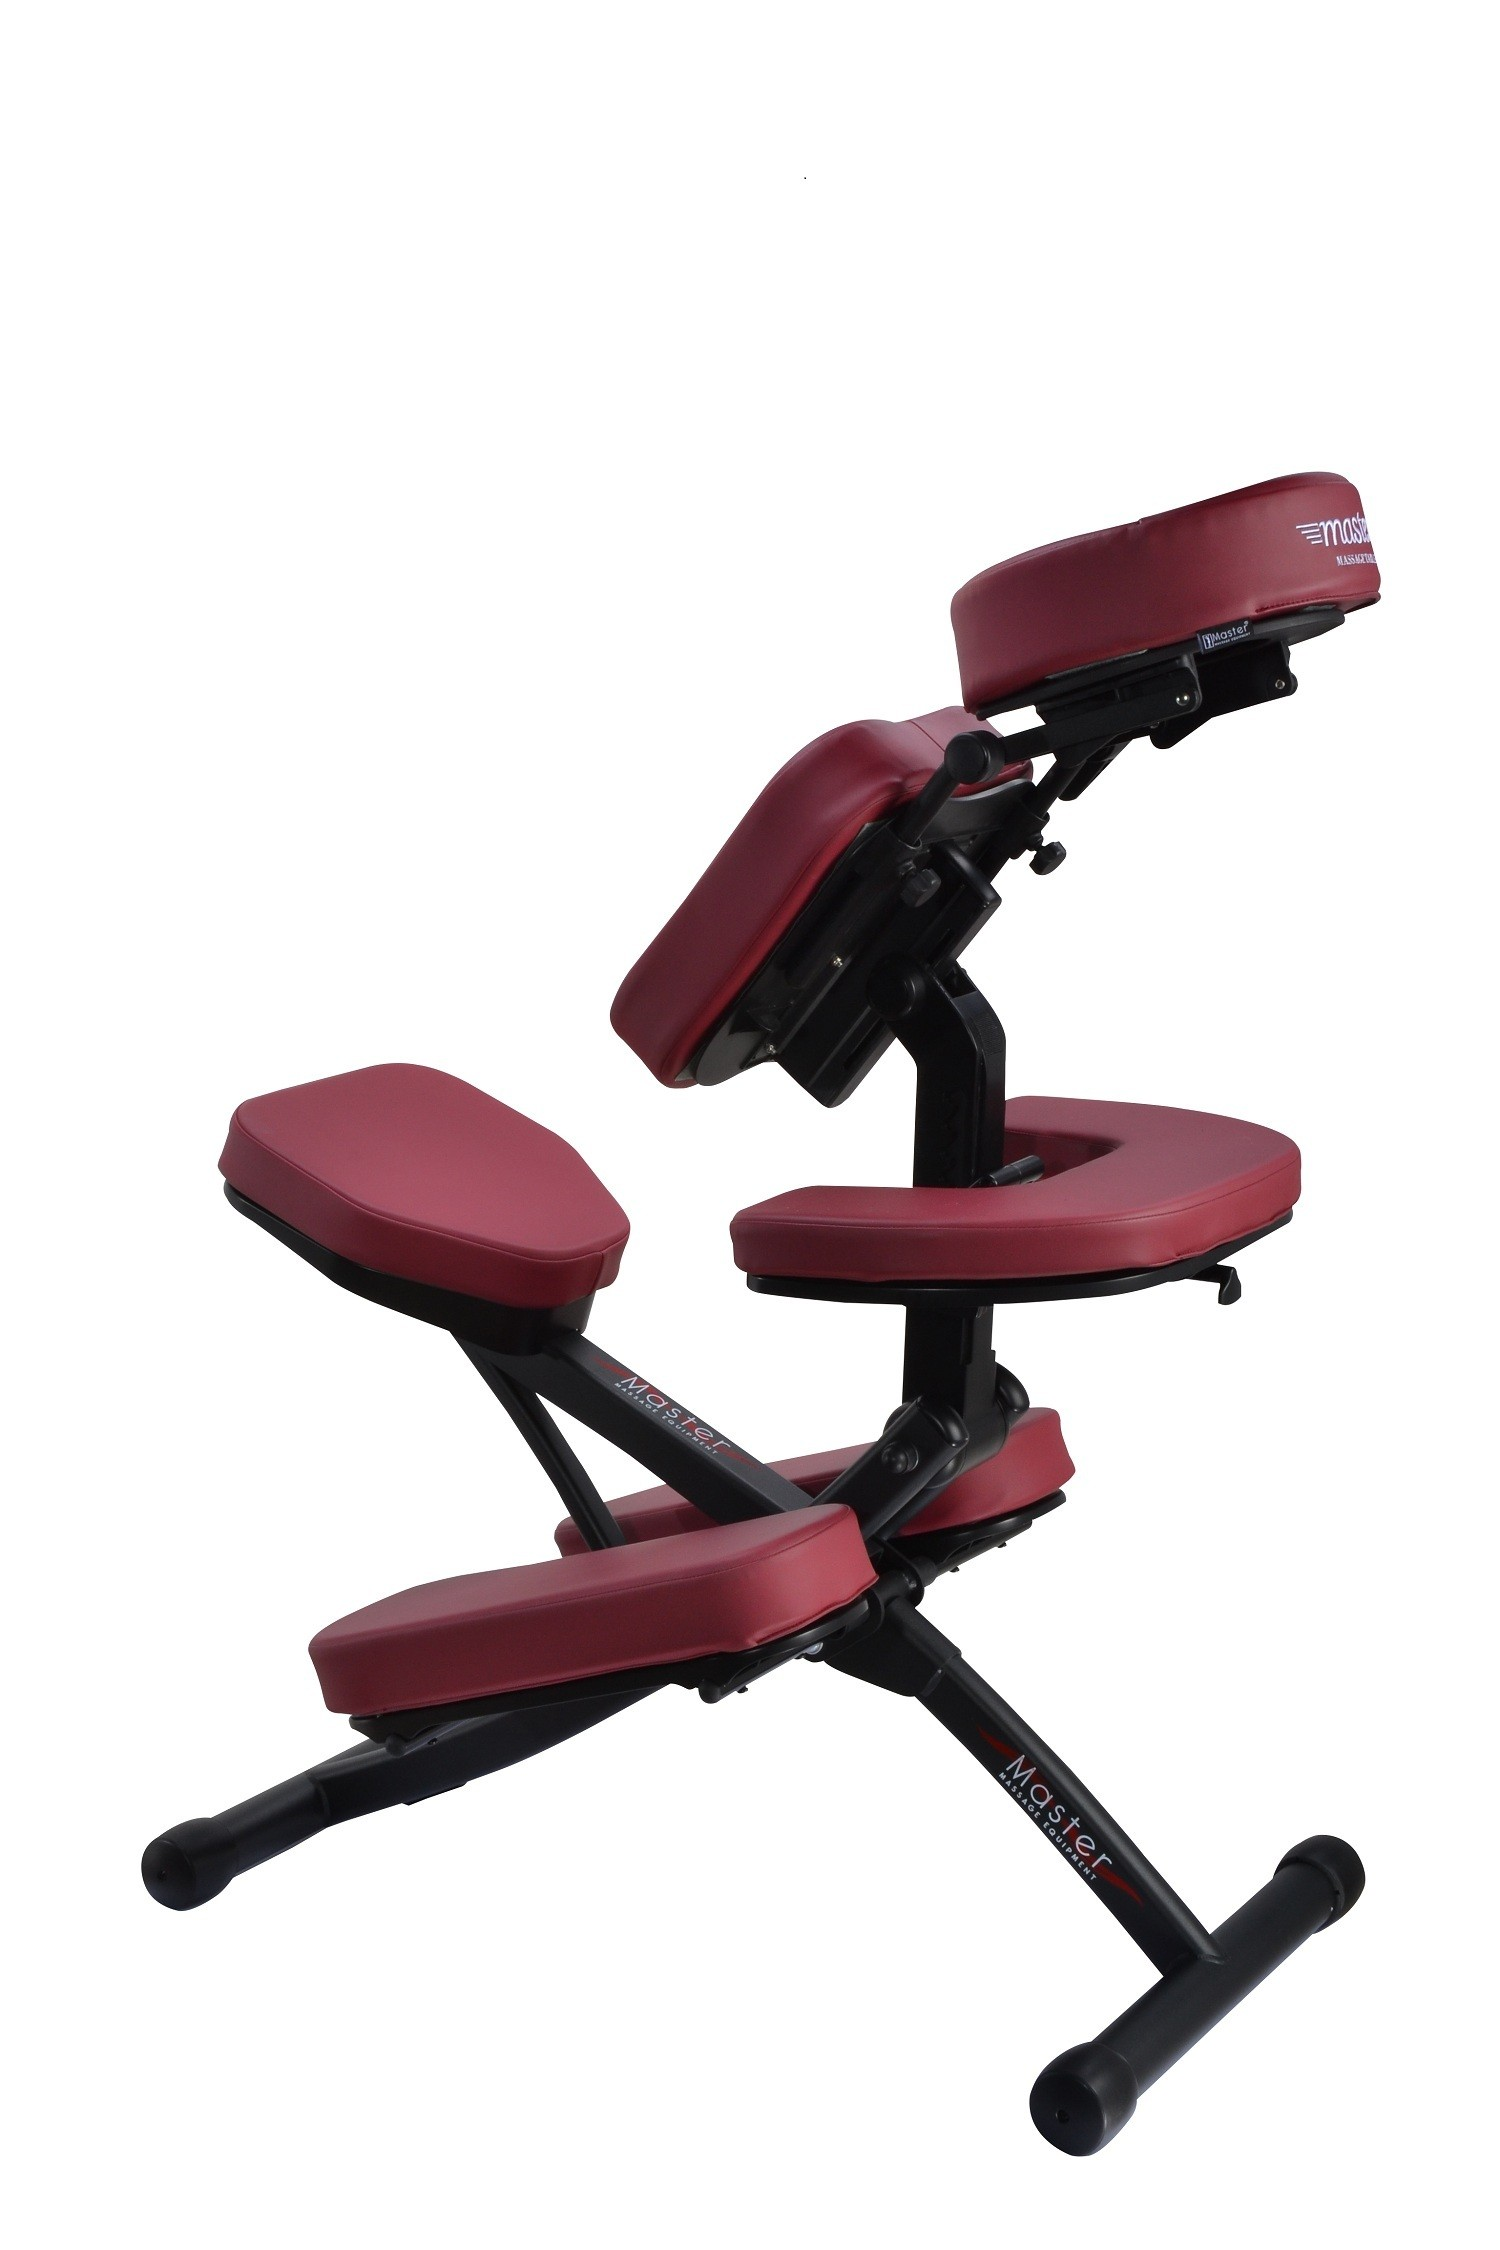 Rio Portable Folding Massage Chair for Spa Tattoo w